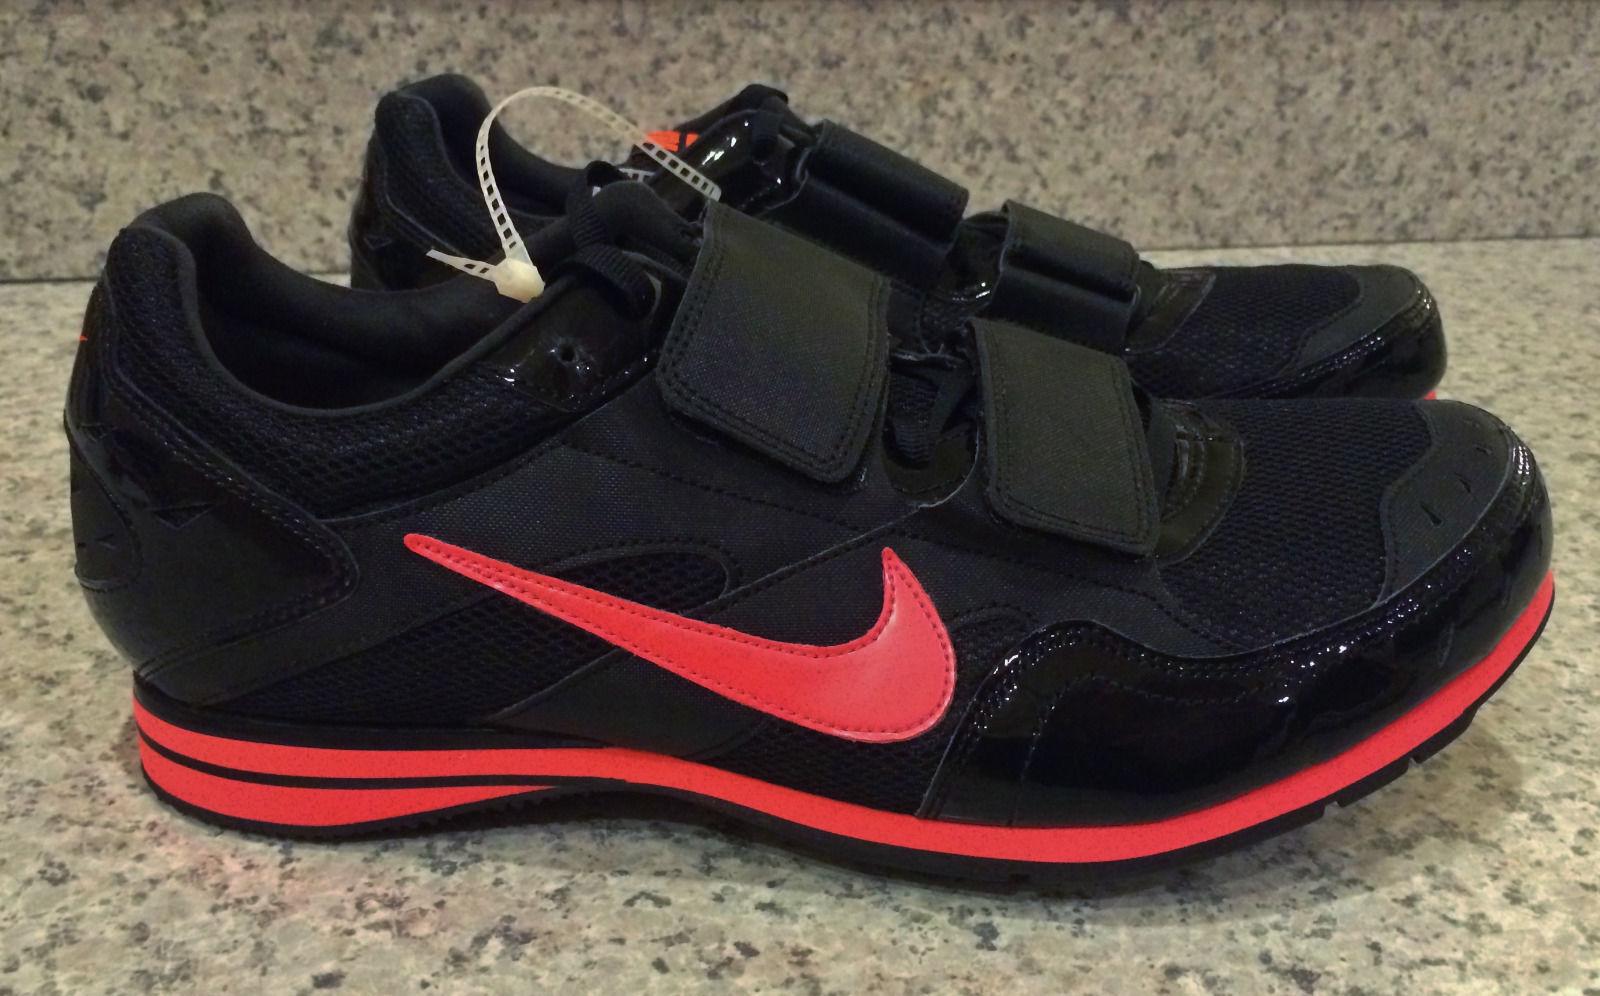 Nike zoom tj 3 - track spikes triple jump schwarz ROT schwarz jump schuhe new mens sz 12 15 359f79